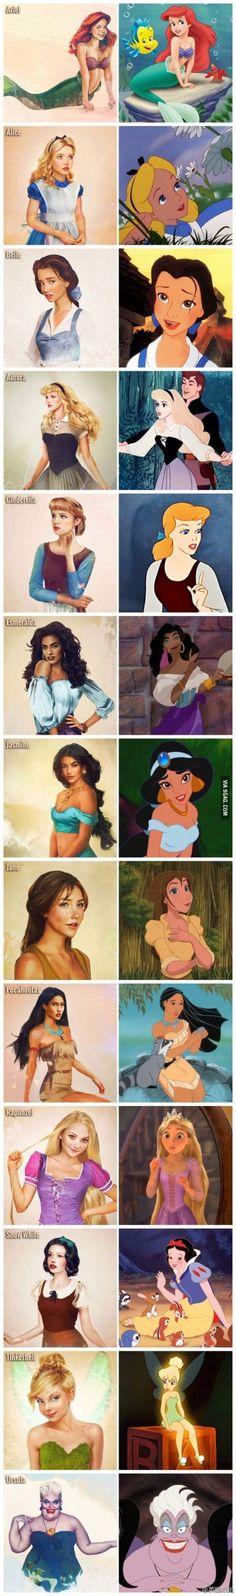 Anyone else notice how Cinderella kinda looks like Taylor Swift?